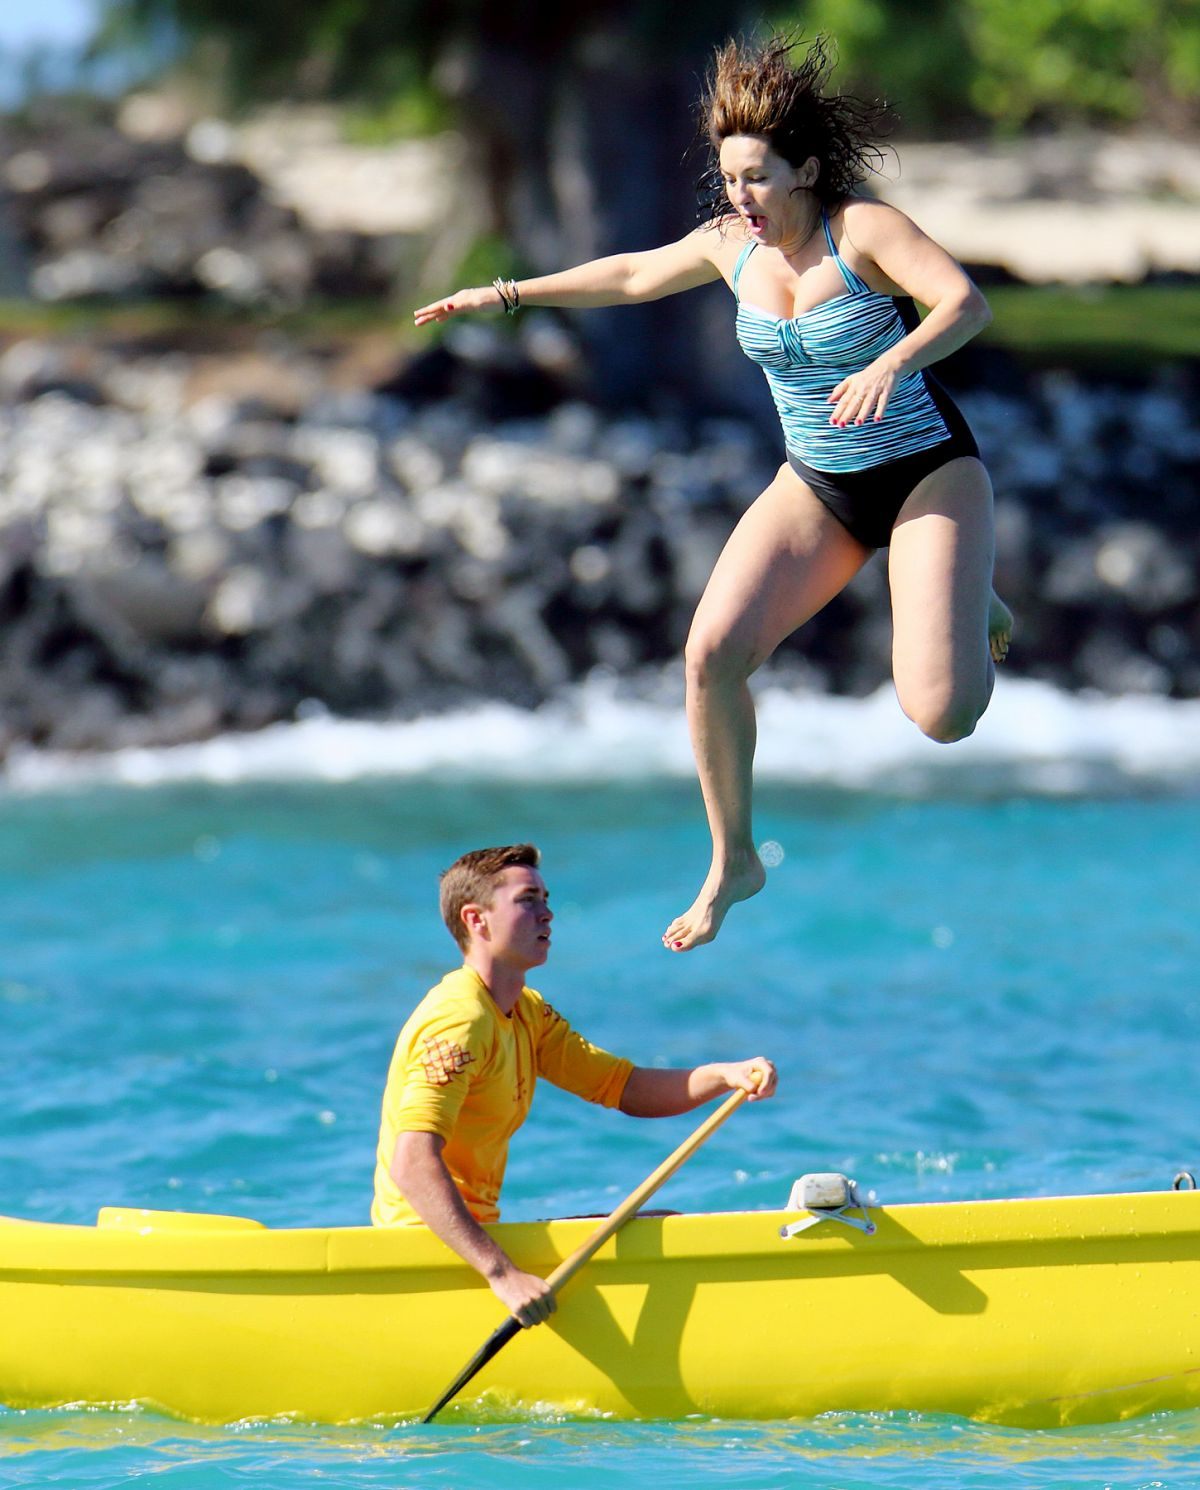 Suggest you Mariska hargitay photos swimming